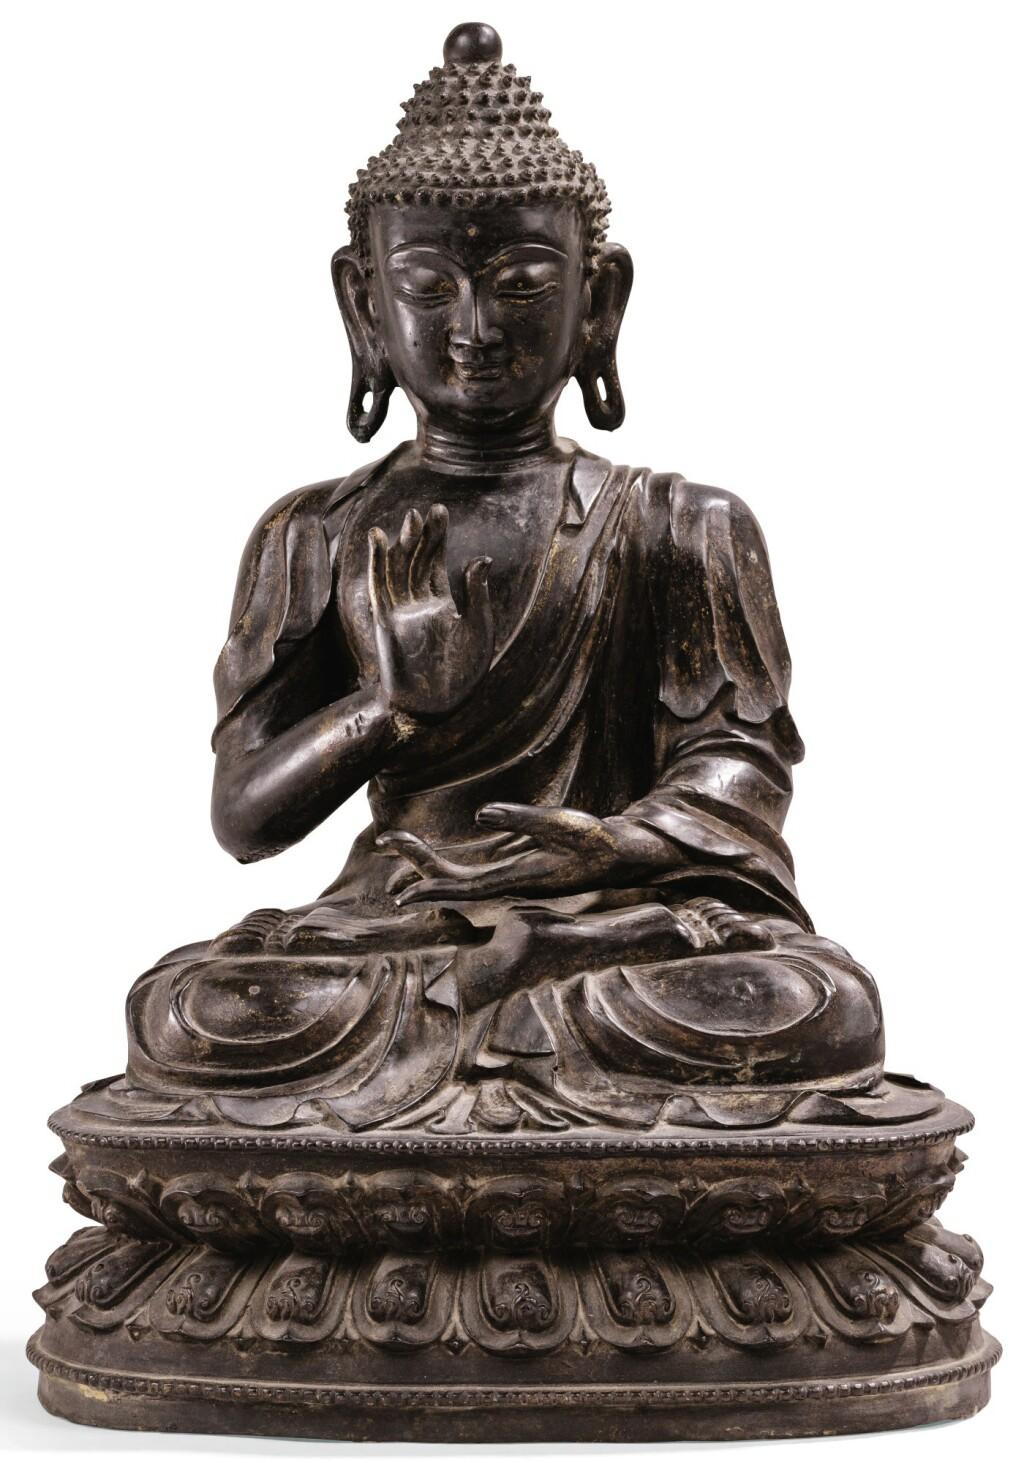 GRANDE ET RARE STATUETTE DE BOUDDHA EN BRONZE DYNASTIE MING, XVIE SIÈCLE | 明十六世紀 鎏金銅佛坐像 | A large and rare bronze figure of Buddha, Ming Dynasty, 16th century